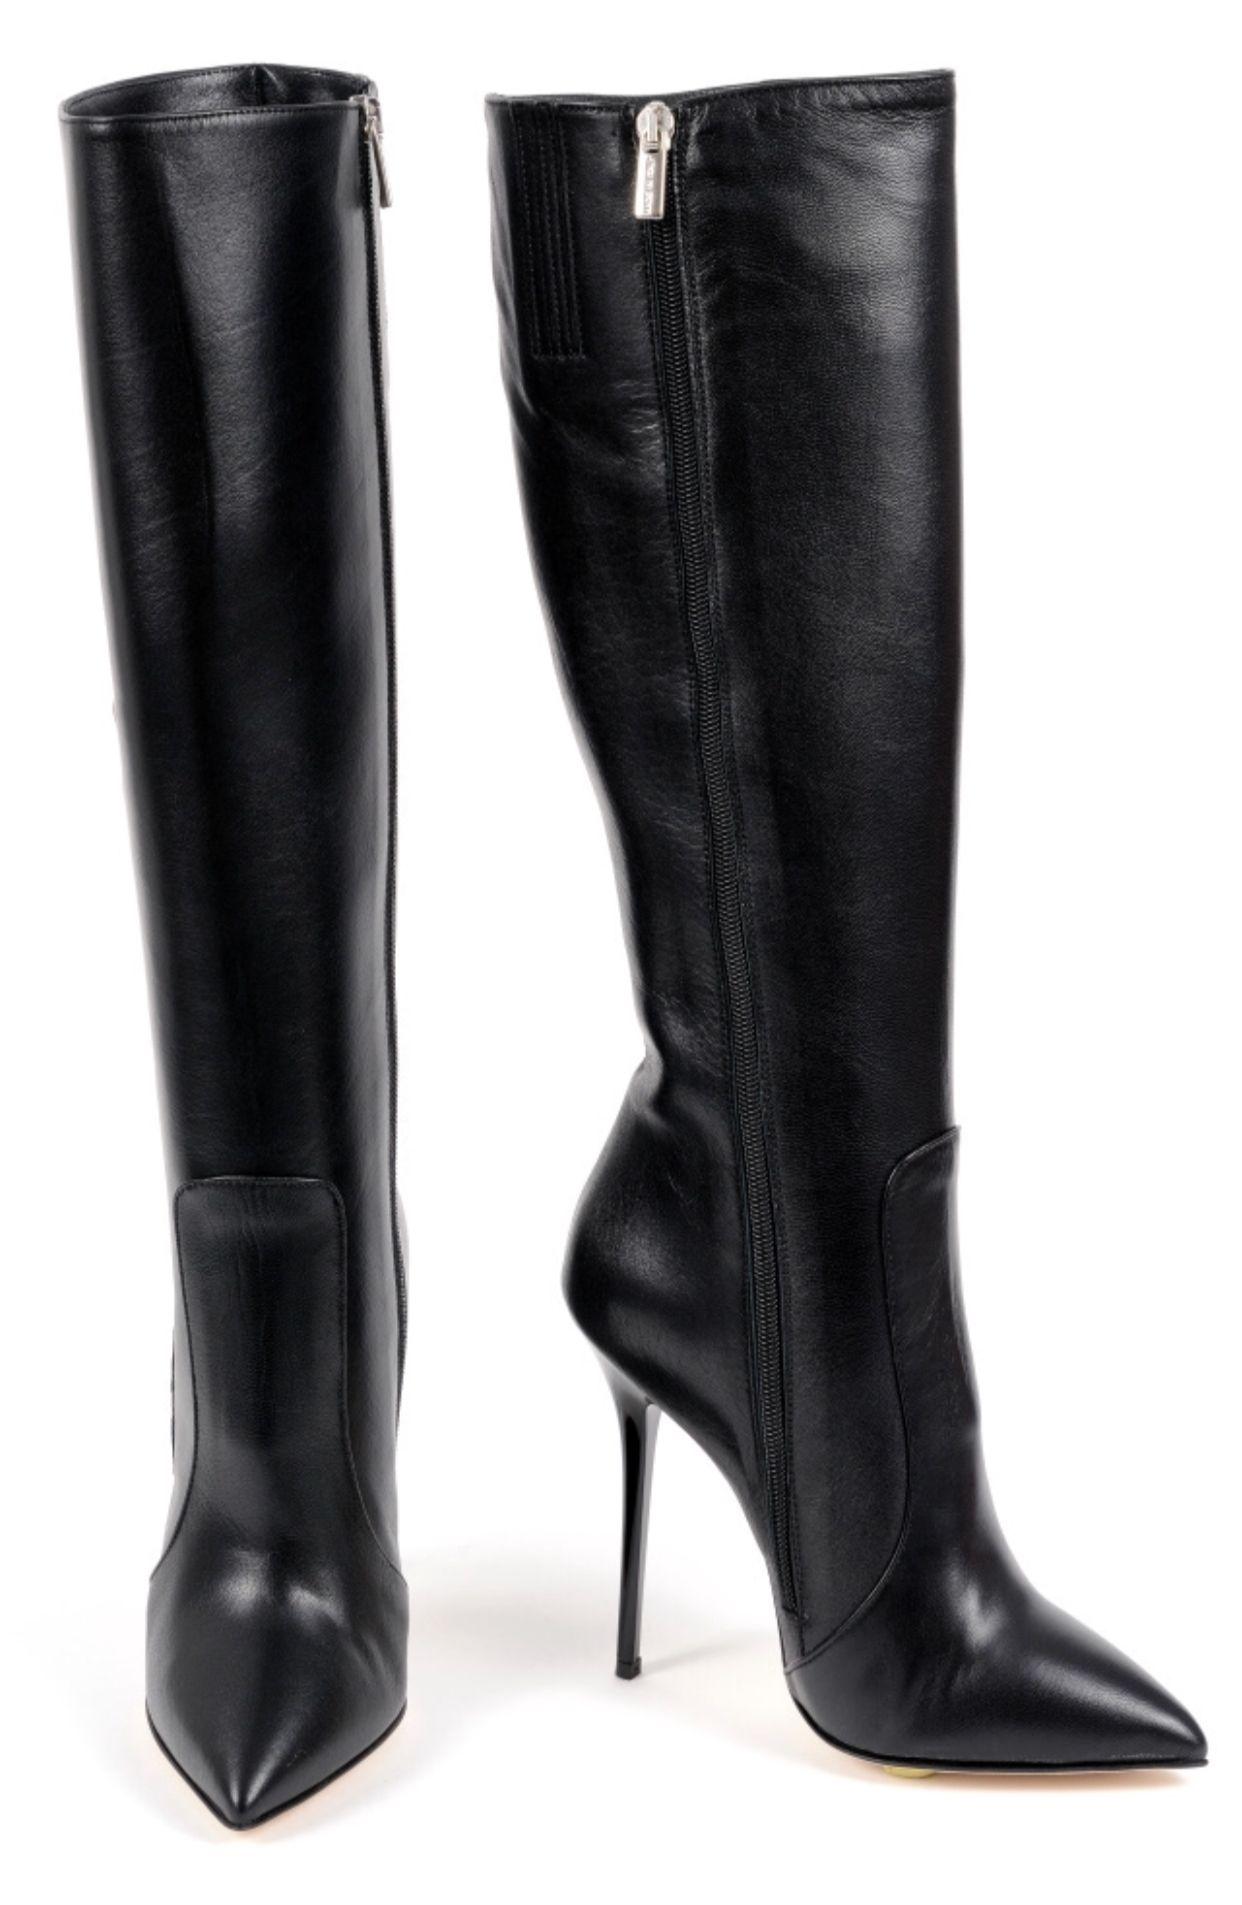 564c490108 High heels boots Cinderela